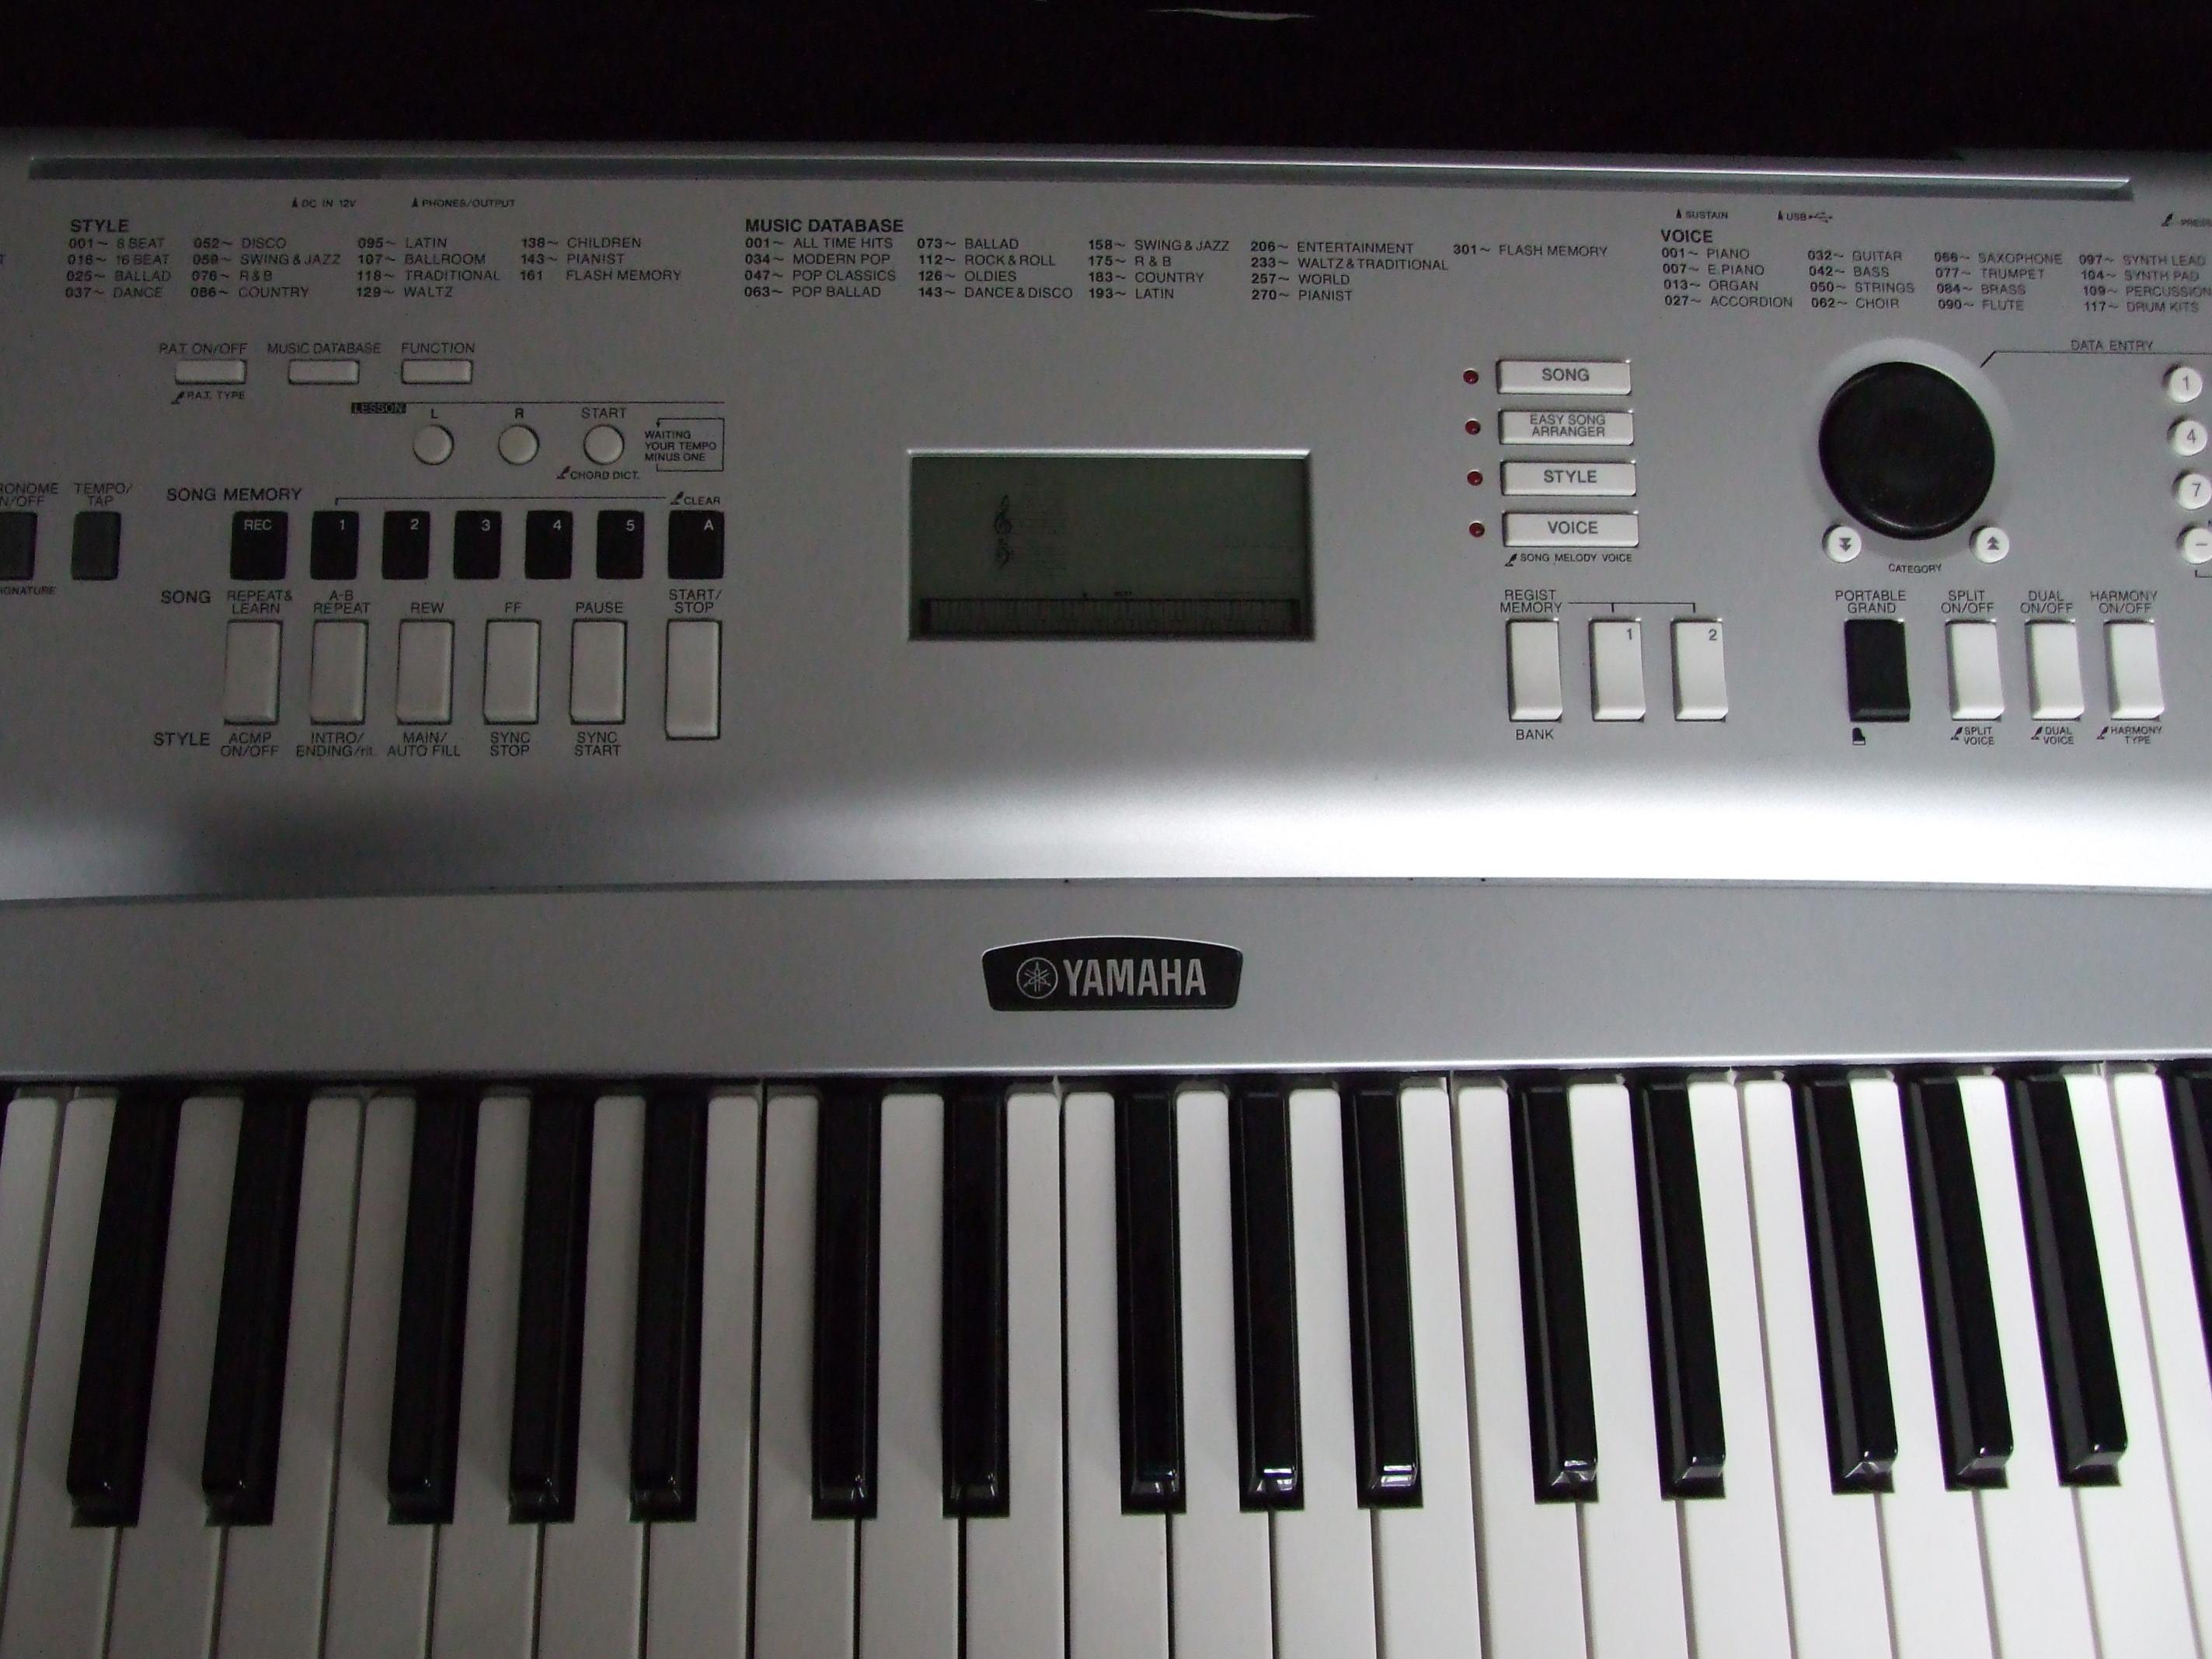 Yamaha Dgx Used For Sale